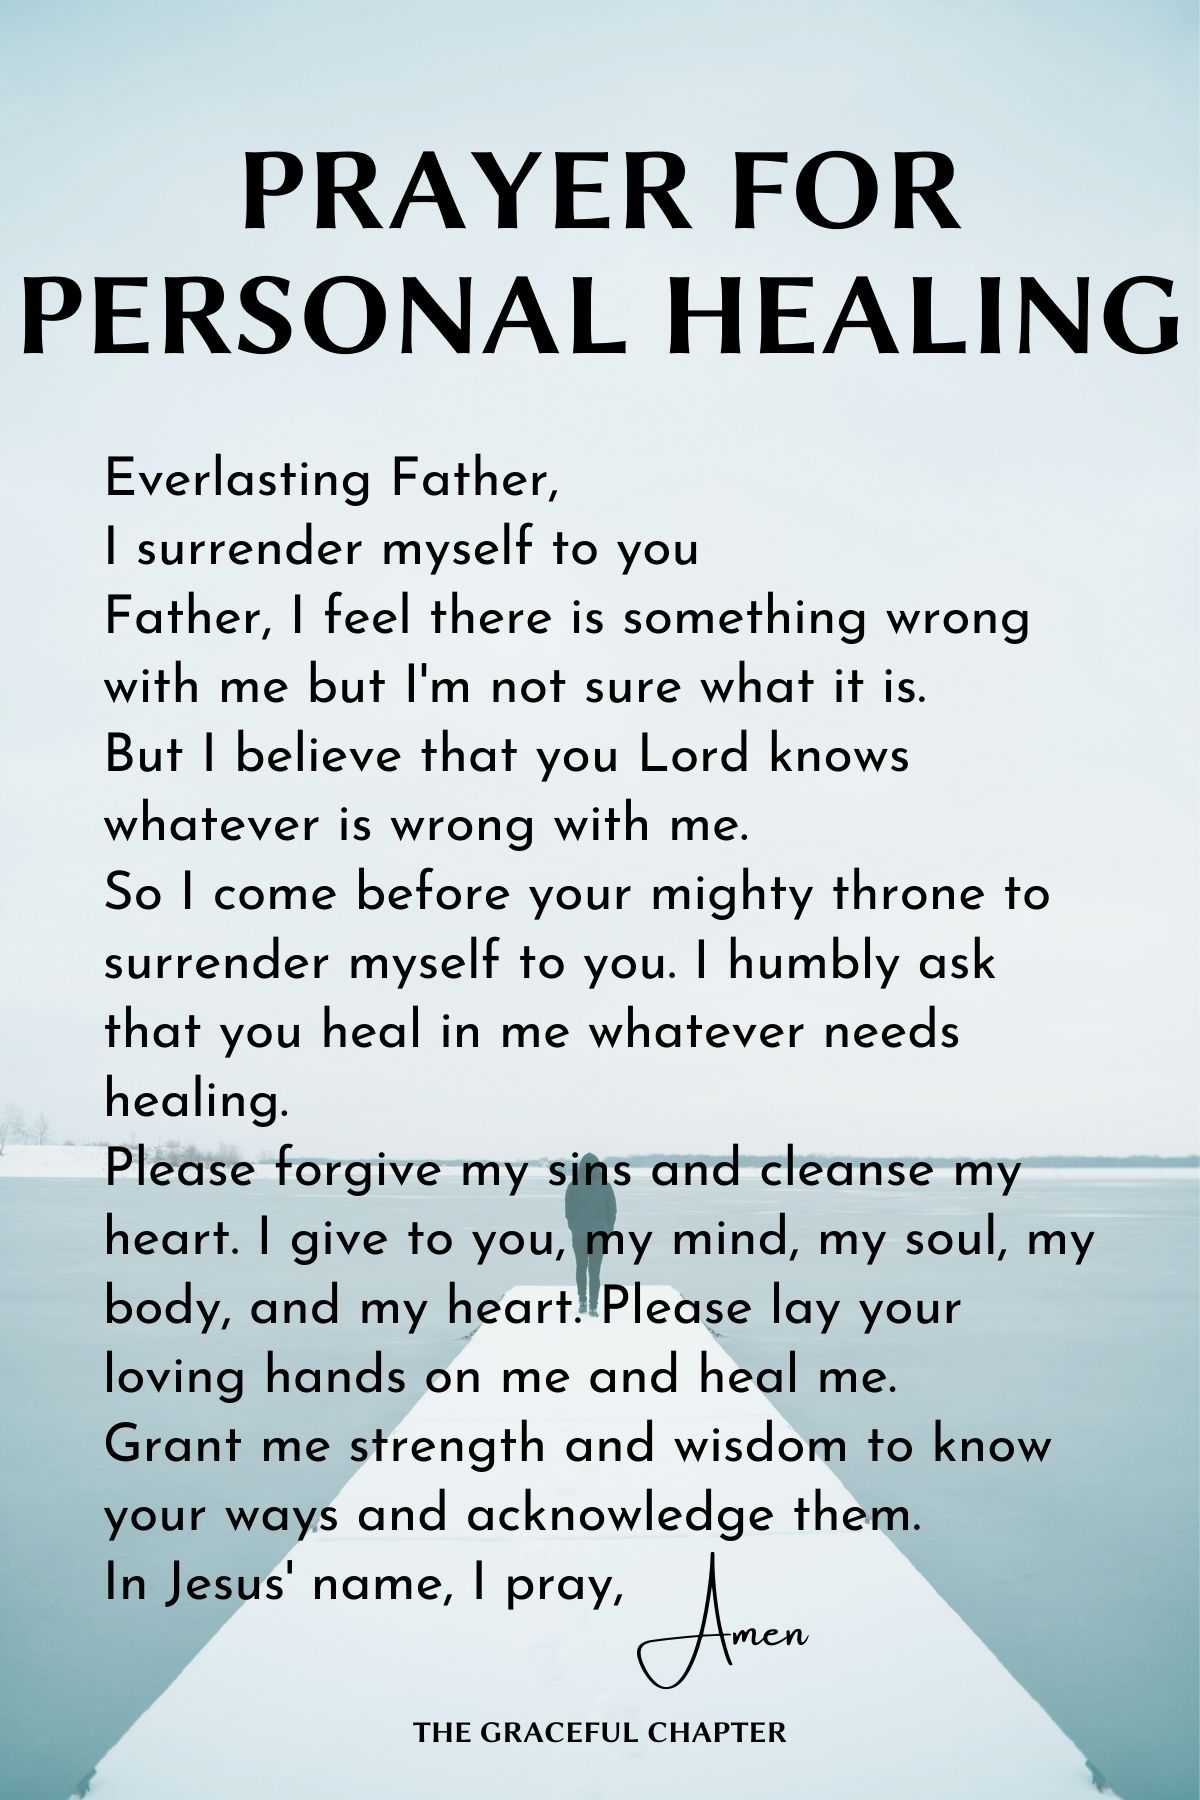 Prayer for personal healing